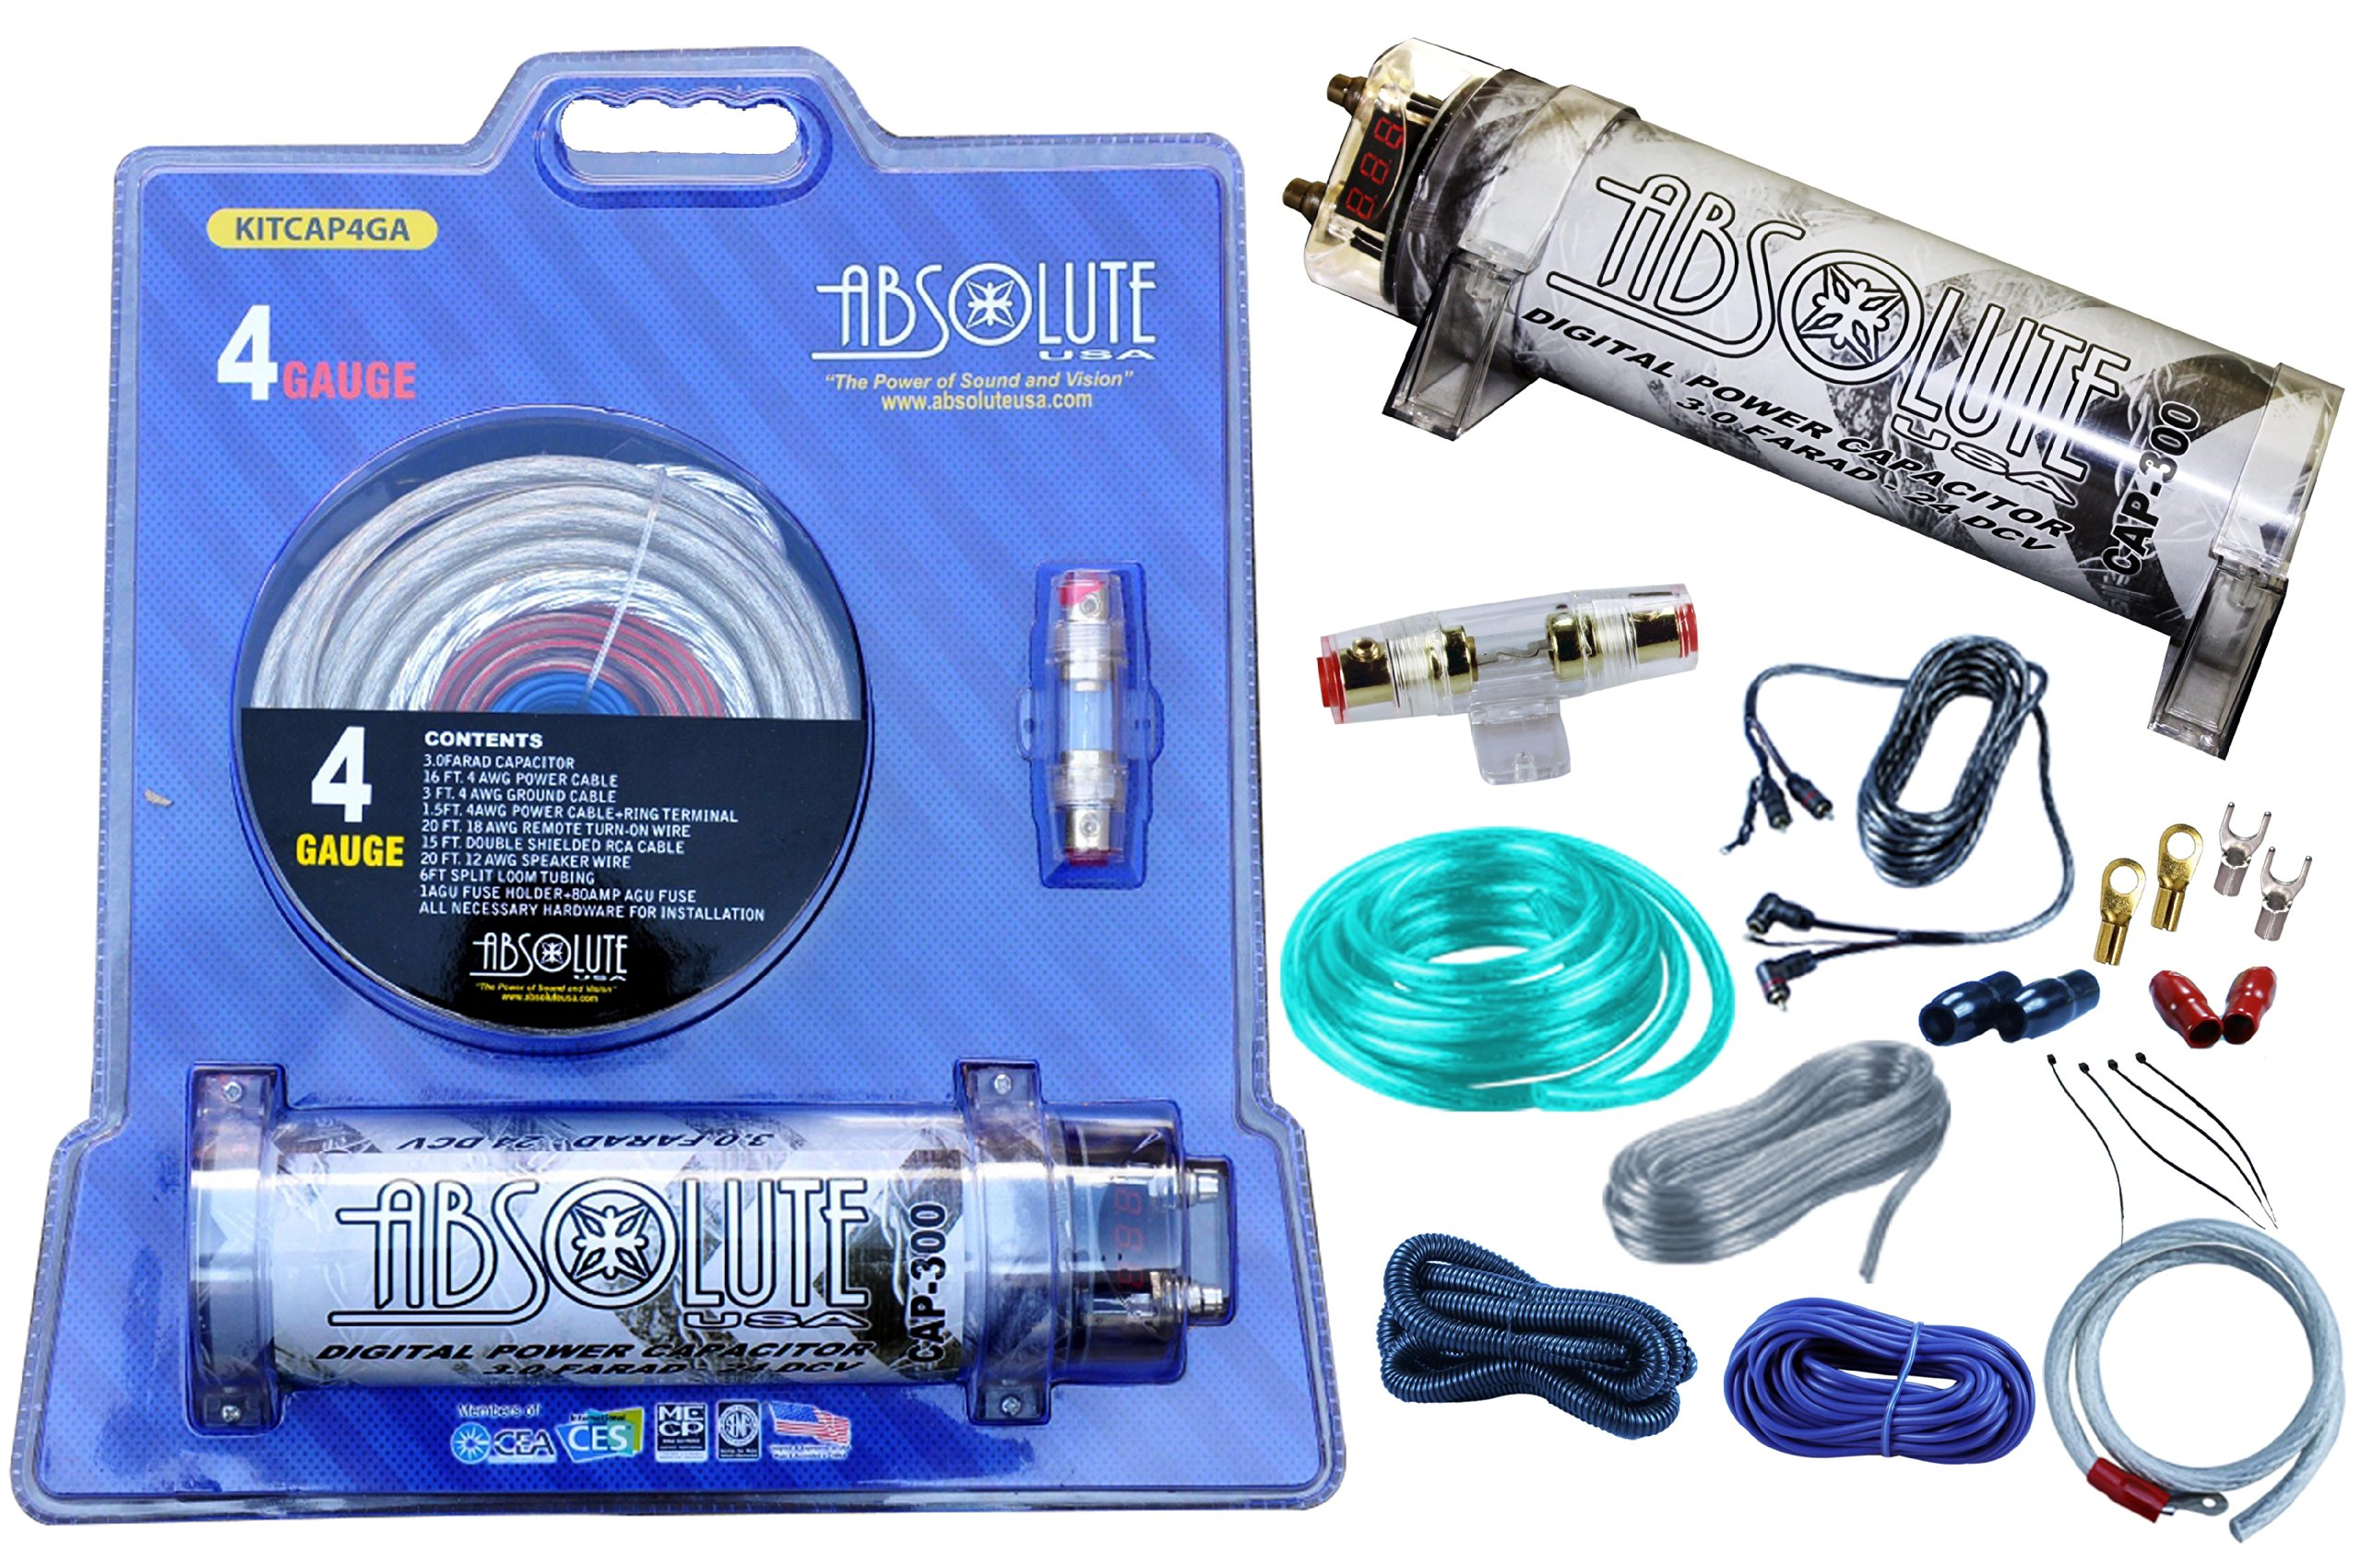 Amazon.com: Absolute USA KITCAP4GASI 3.0 Farad Power Capacitor 4 Gauge Car  Amplifier Installation Wiring Complete Kit (Silver): Car ElectronicsAmazon.com